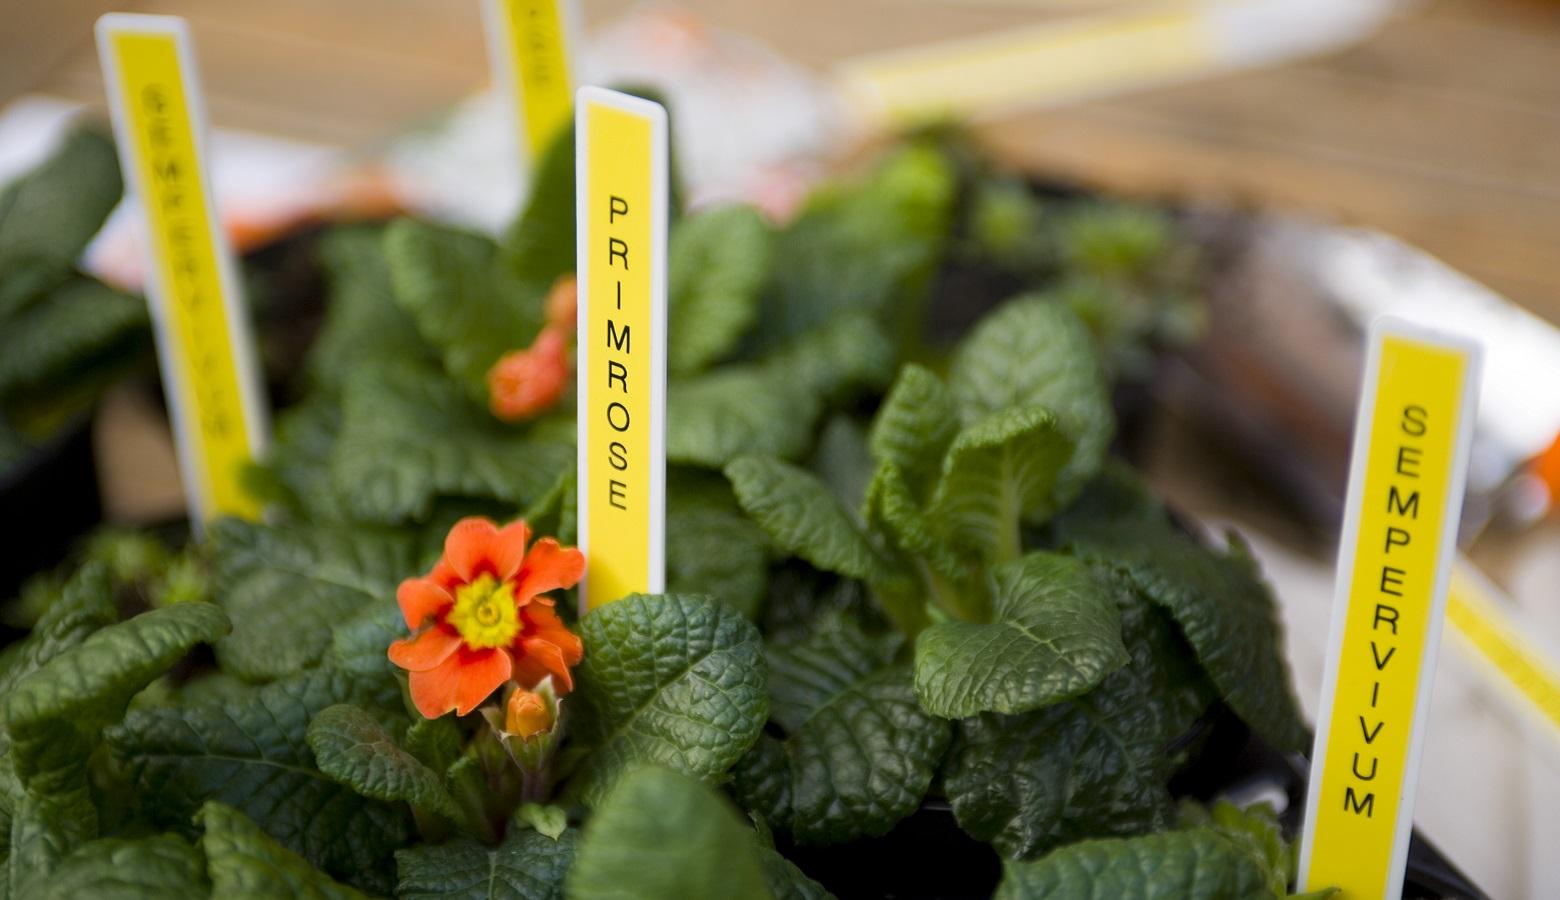 Vasi da giardino etichettati con etichettatrice Brother